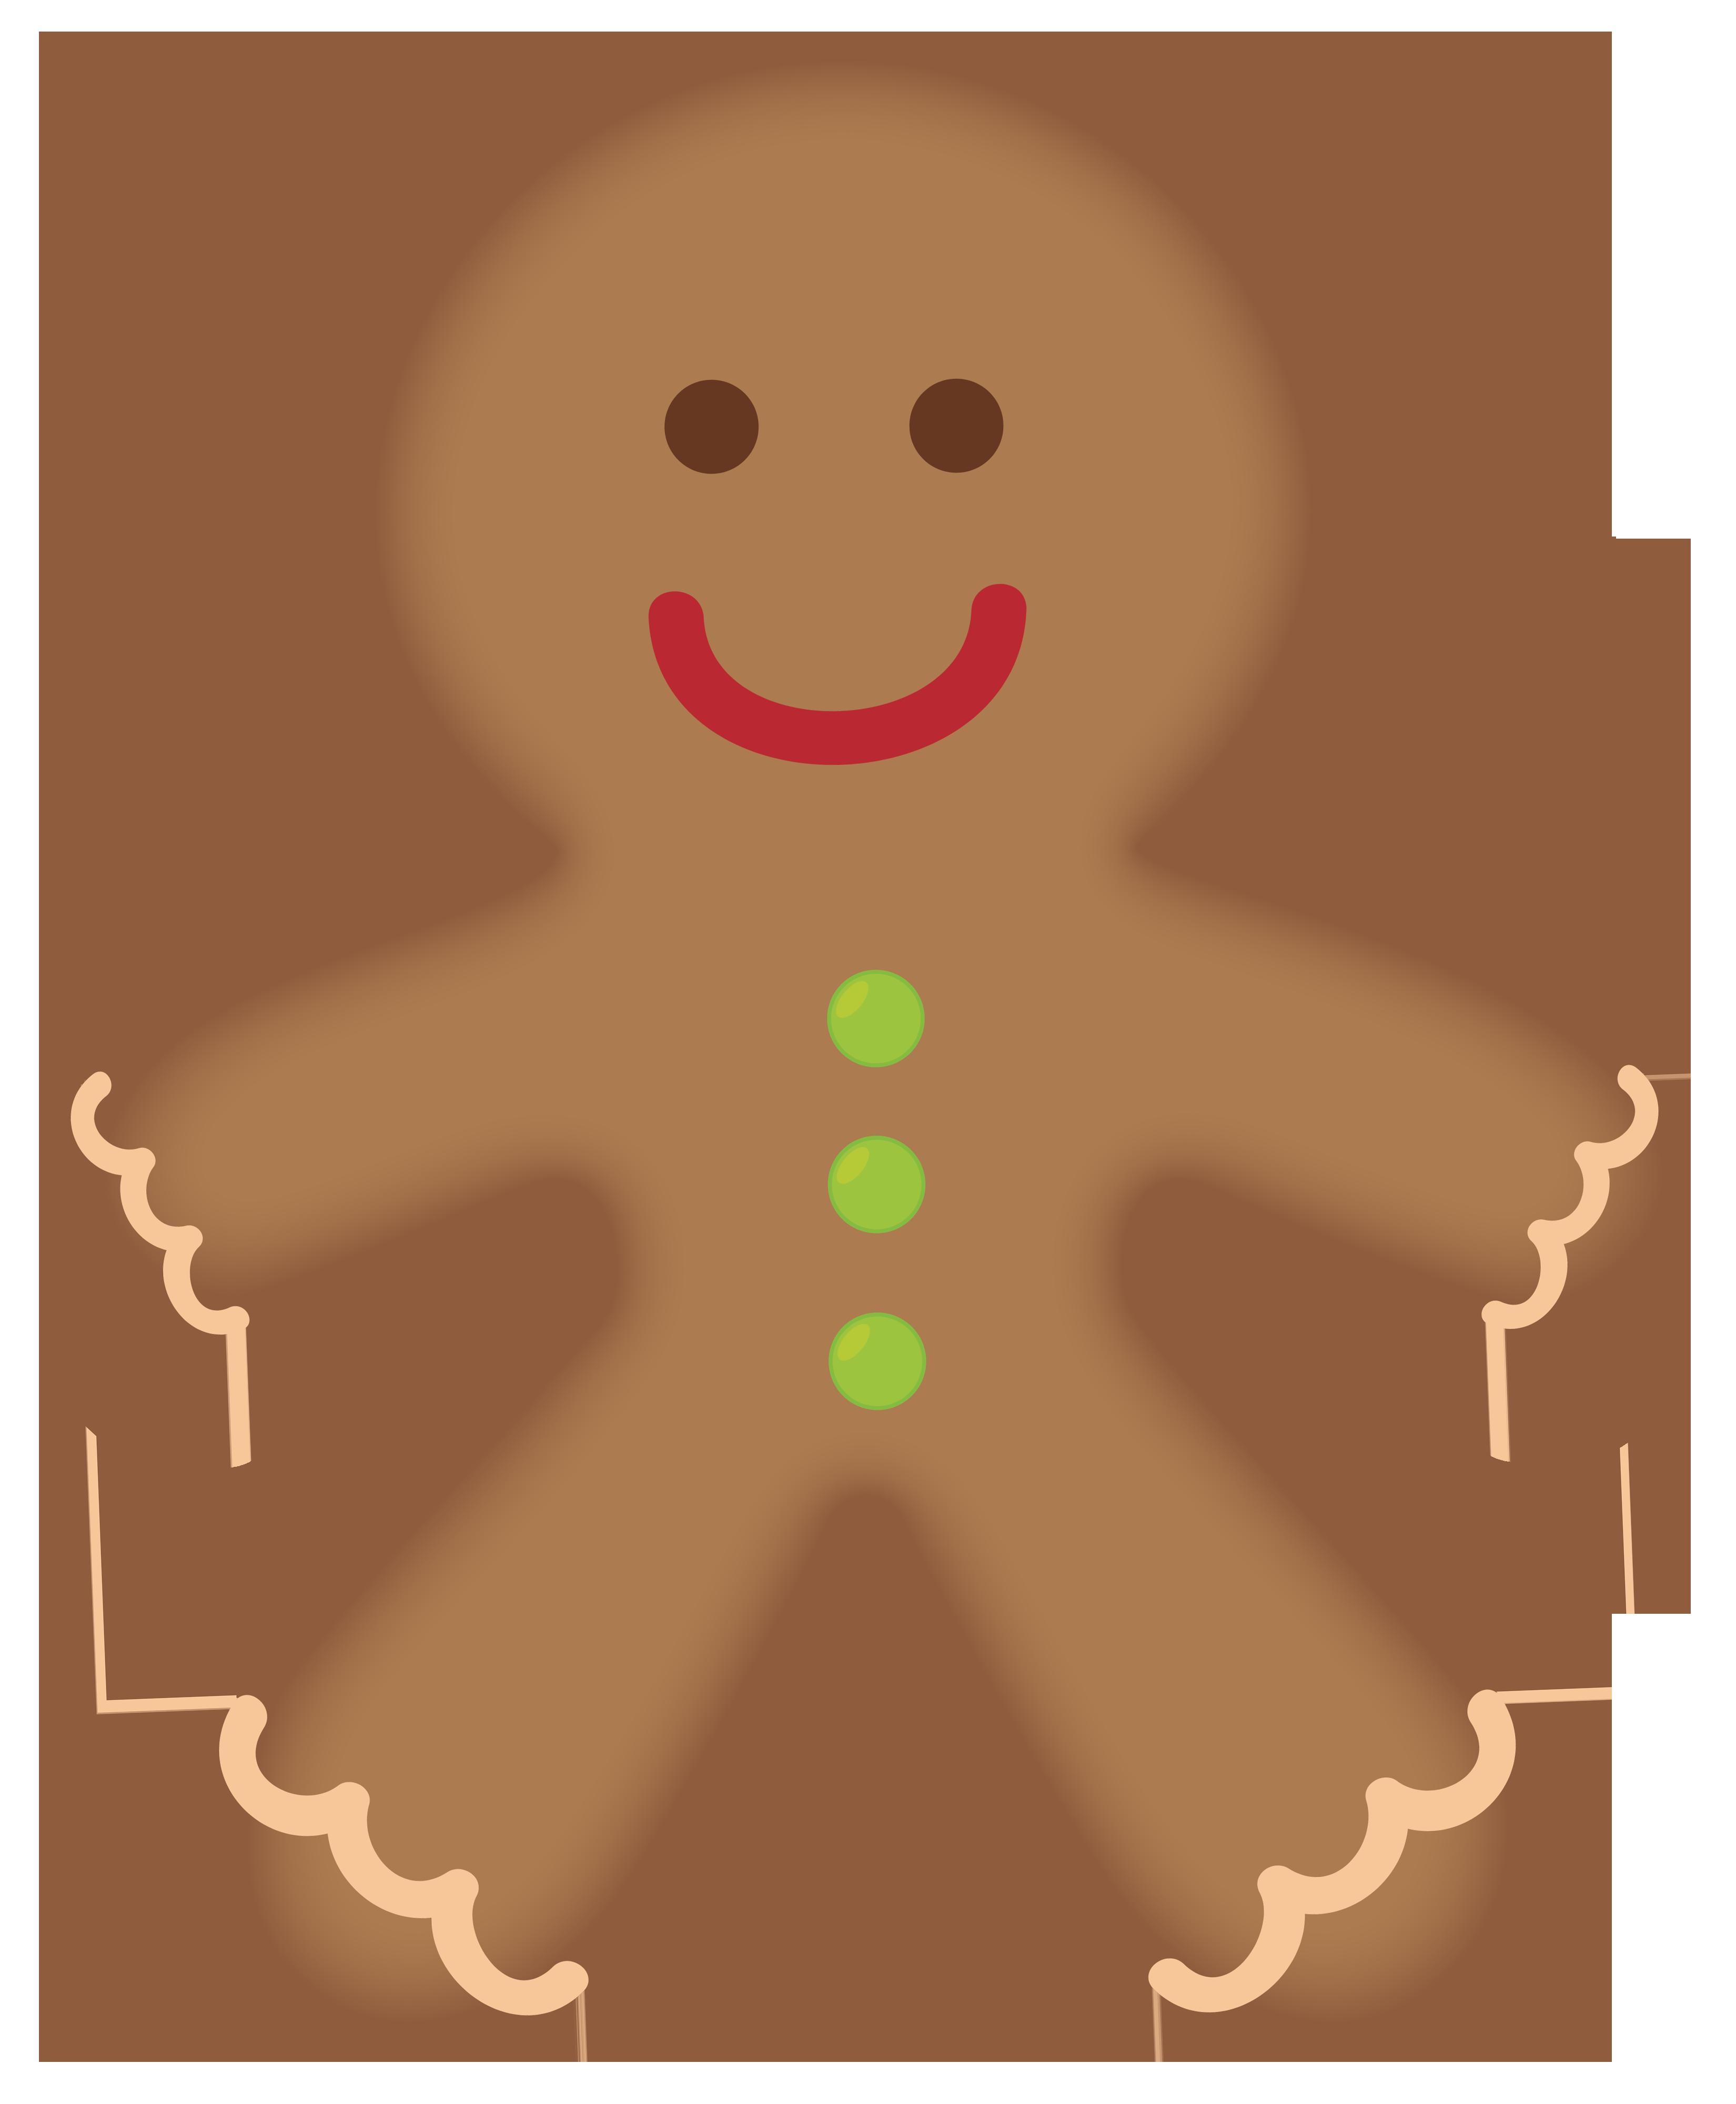 Gingerbread man men web. Softball clipart batting cage